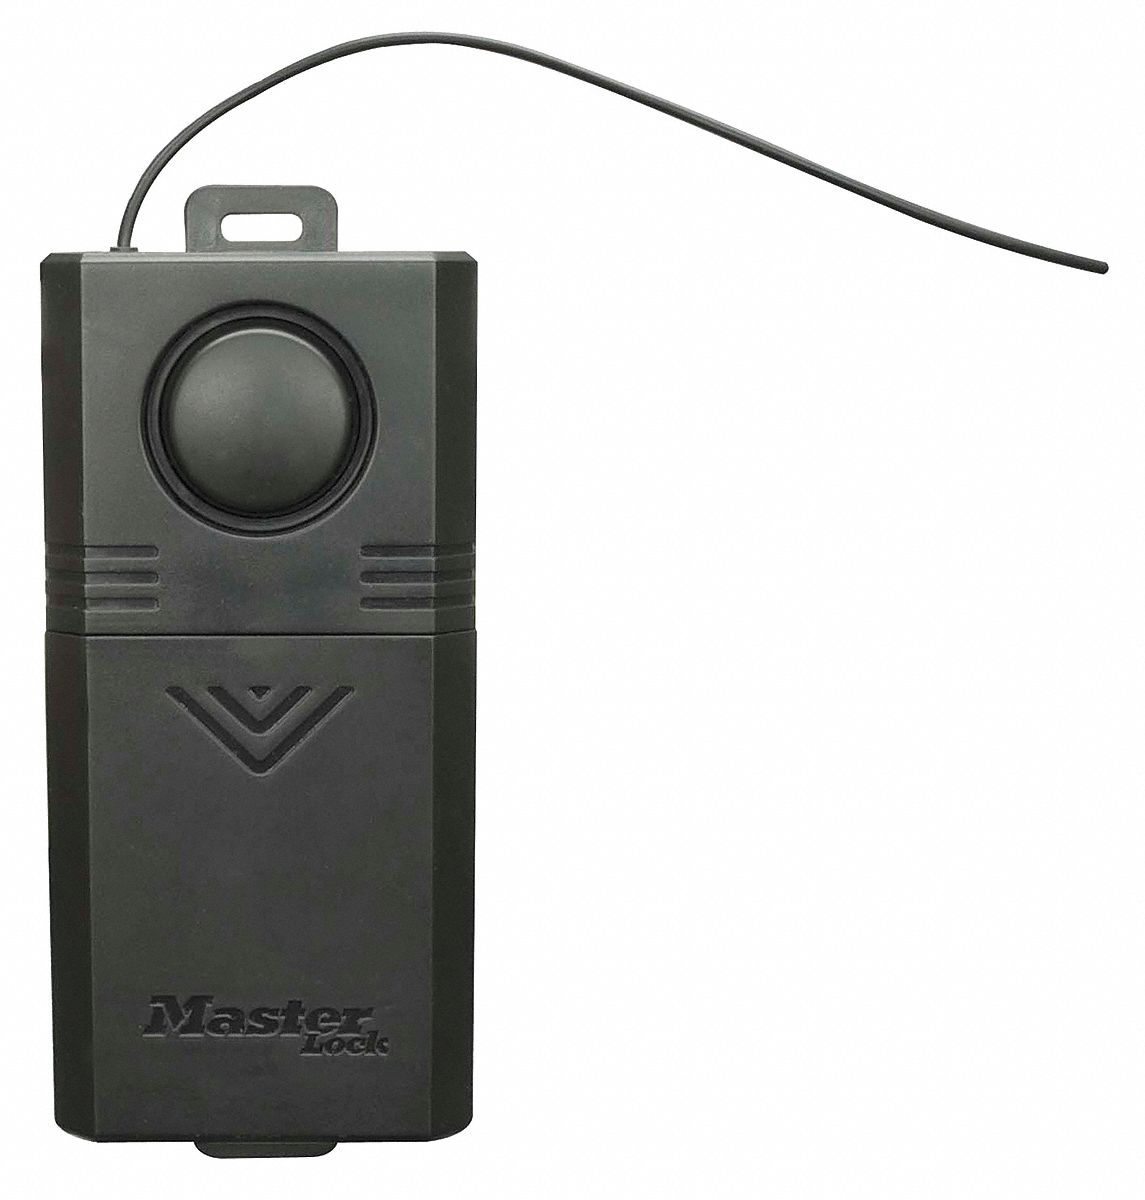 Wireless Alarms